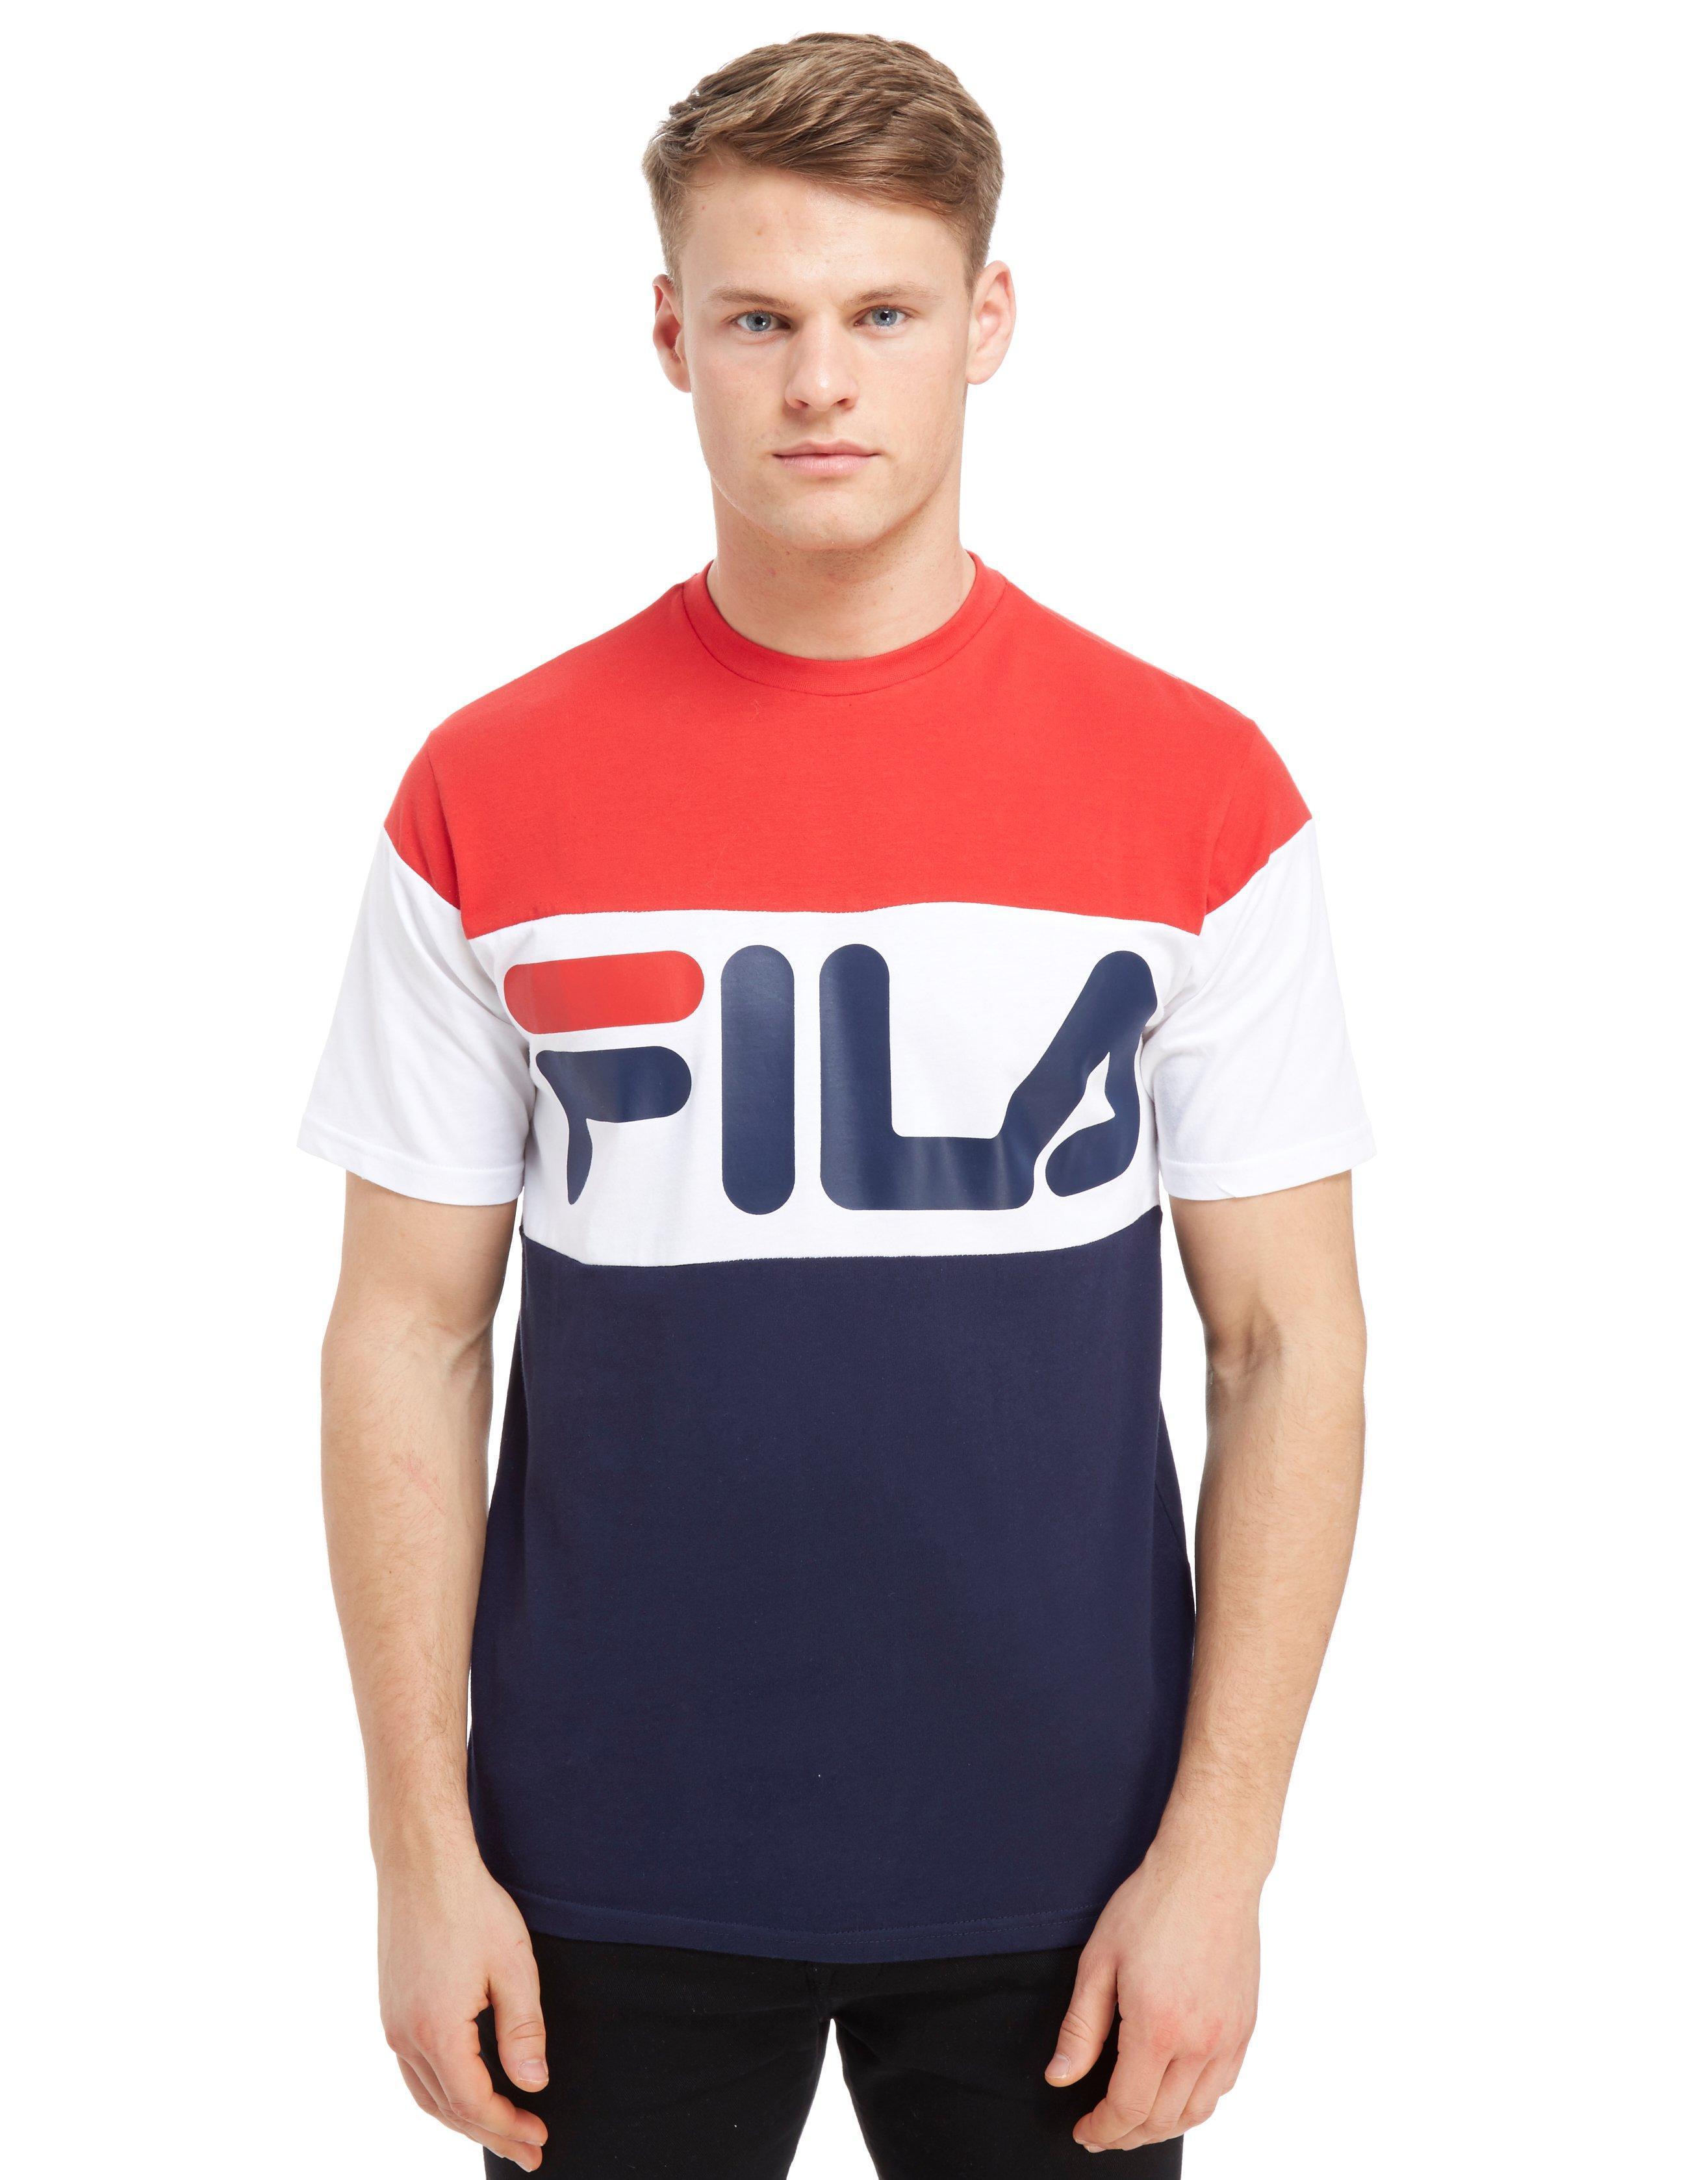 6993b434096 Fila Ewan 3 Pan T-shirt for Men - Lyst